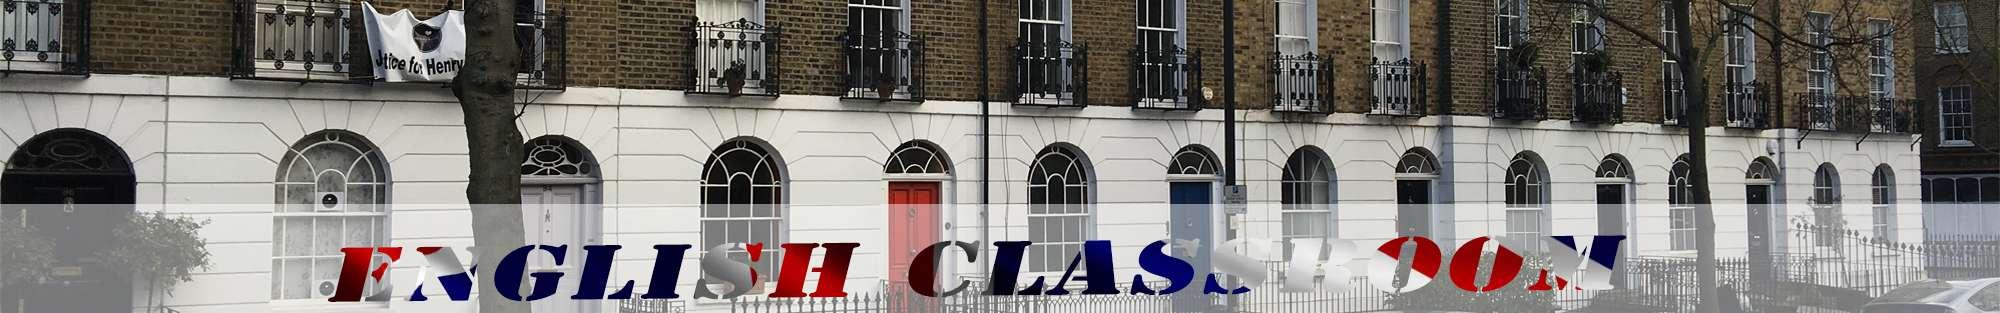 terraced houses header english classroom